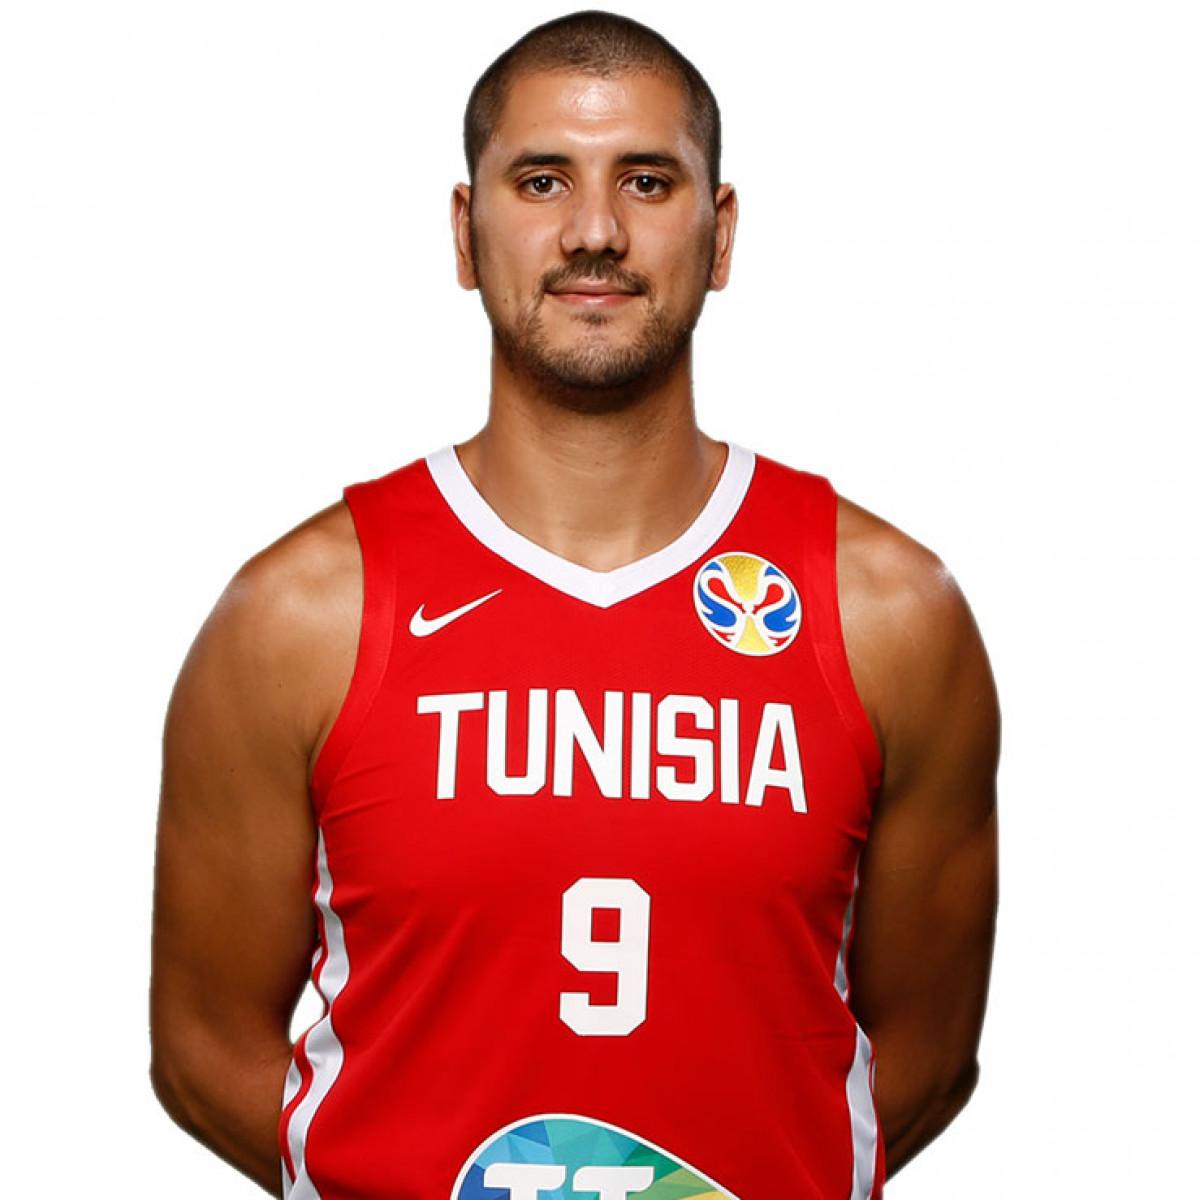 Photo of Mohamed Hadidane, 2019-2020 season